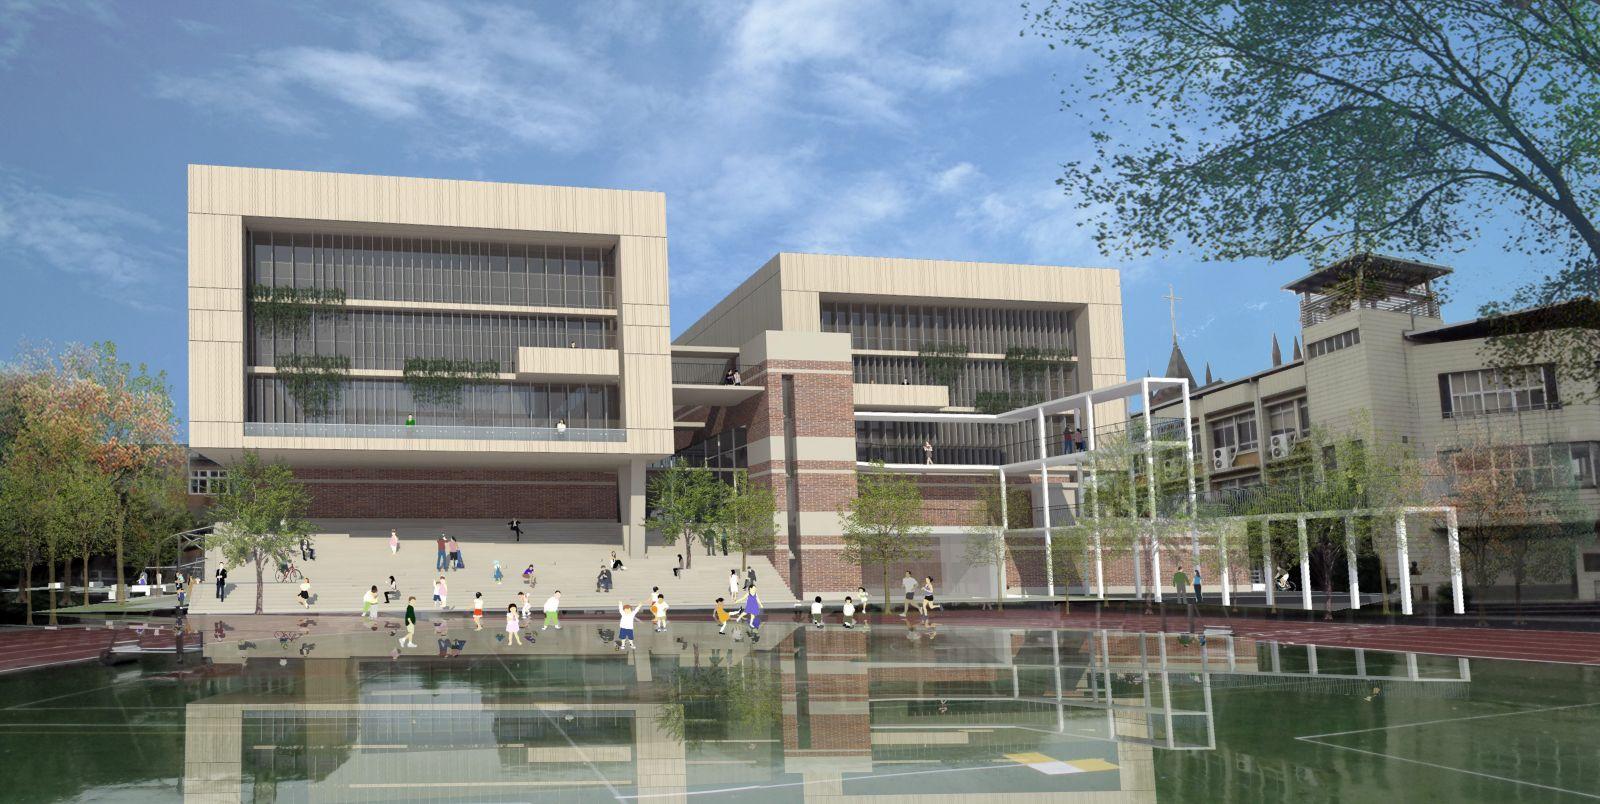 Daxi primary school sports center,taoyuan